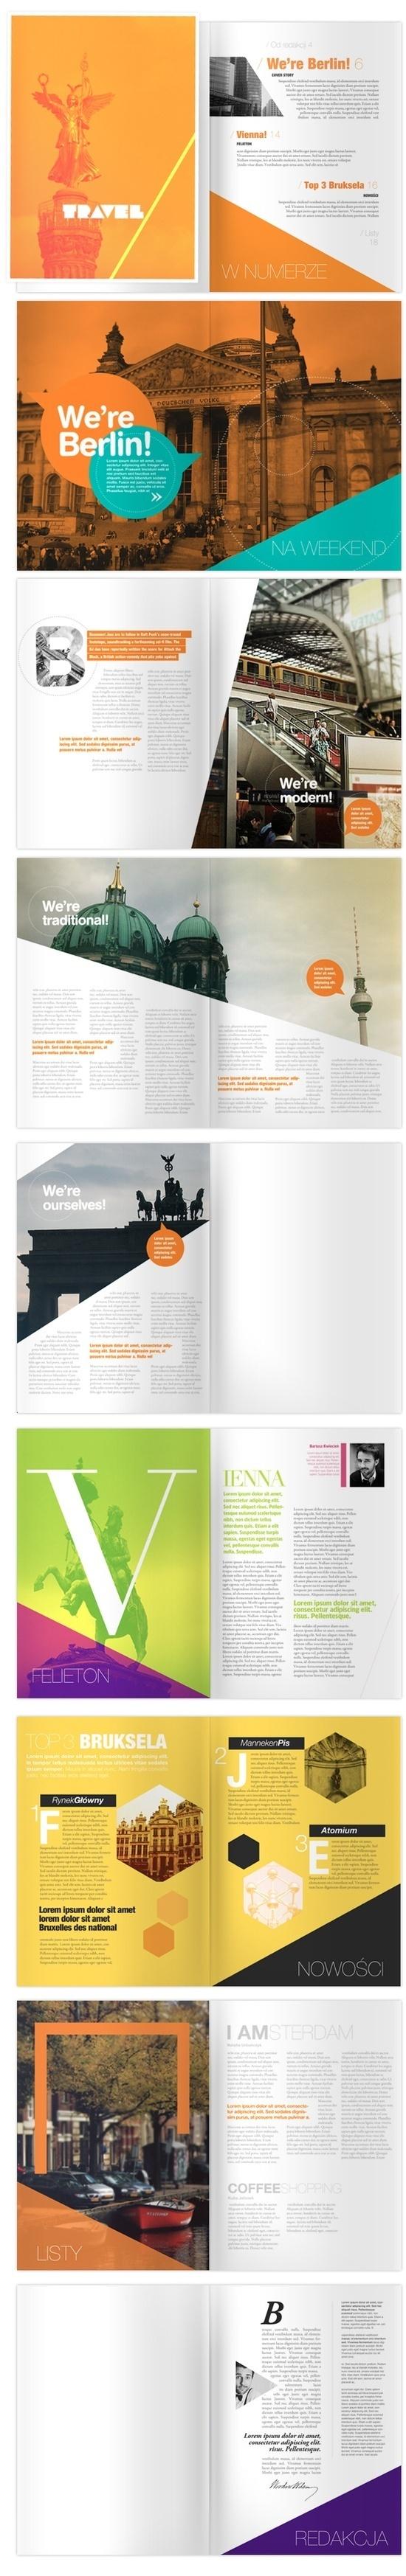 TRAVEL Magazine #travel magazine